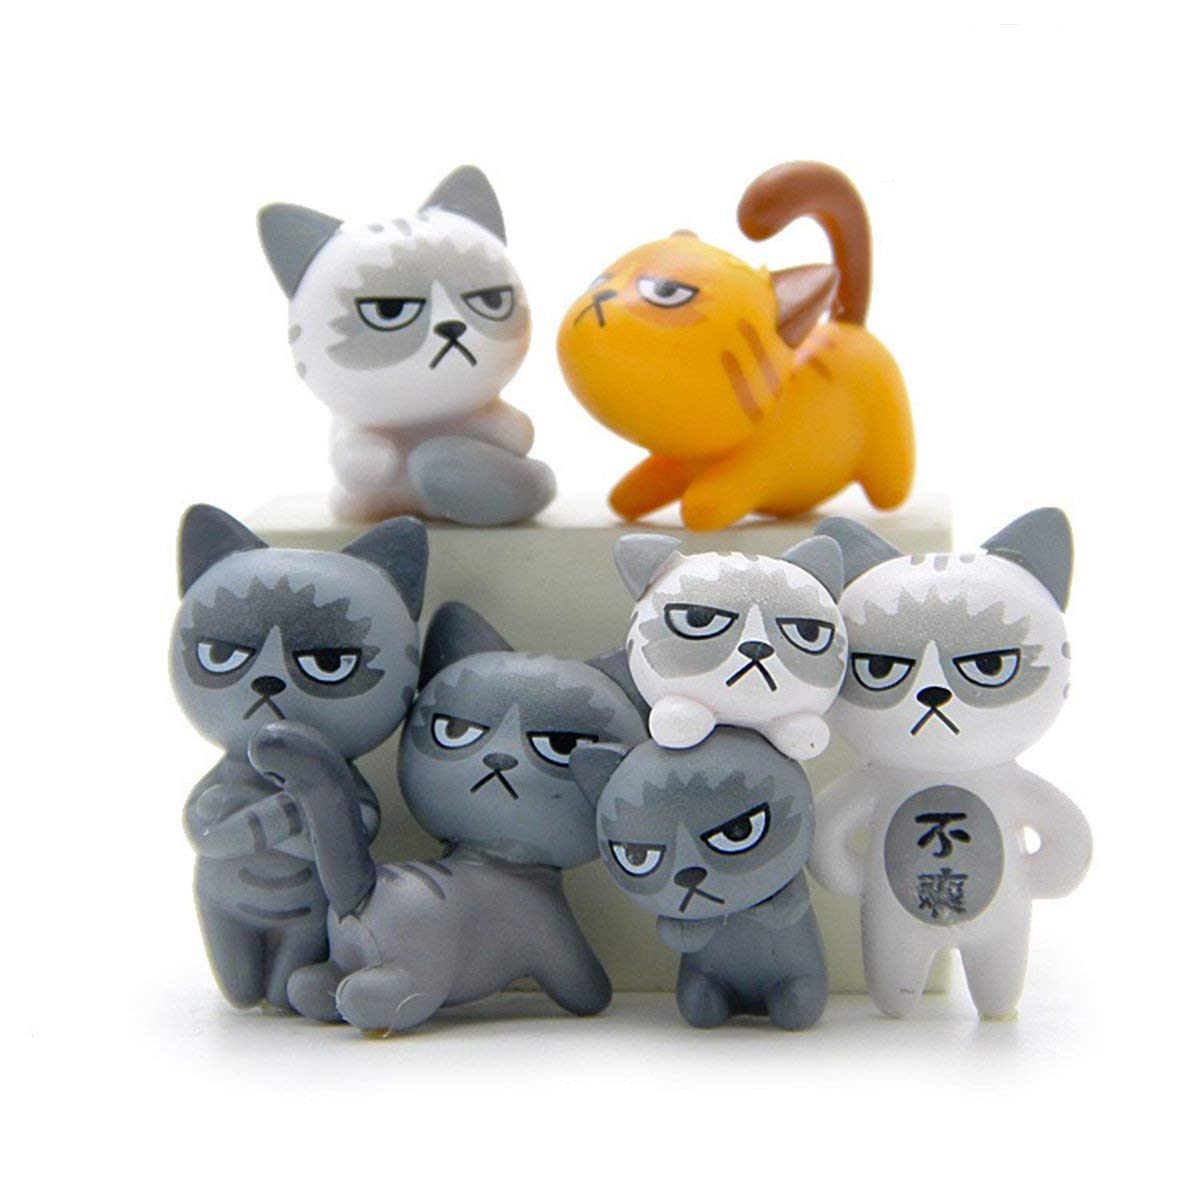 Kalolary 6Pcs/Set Cute Unhappy Cat Doll statue Diy Mini Cartoon Figure Fairy Garden gnome Home Décor Accessorie, Baby Room Decoration Kids Gifts